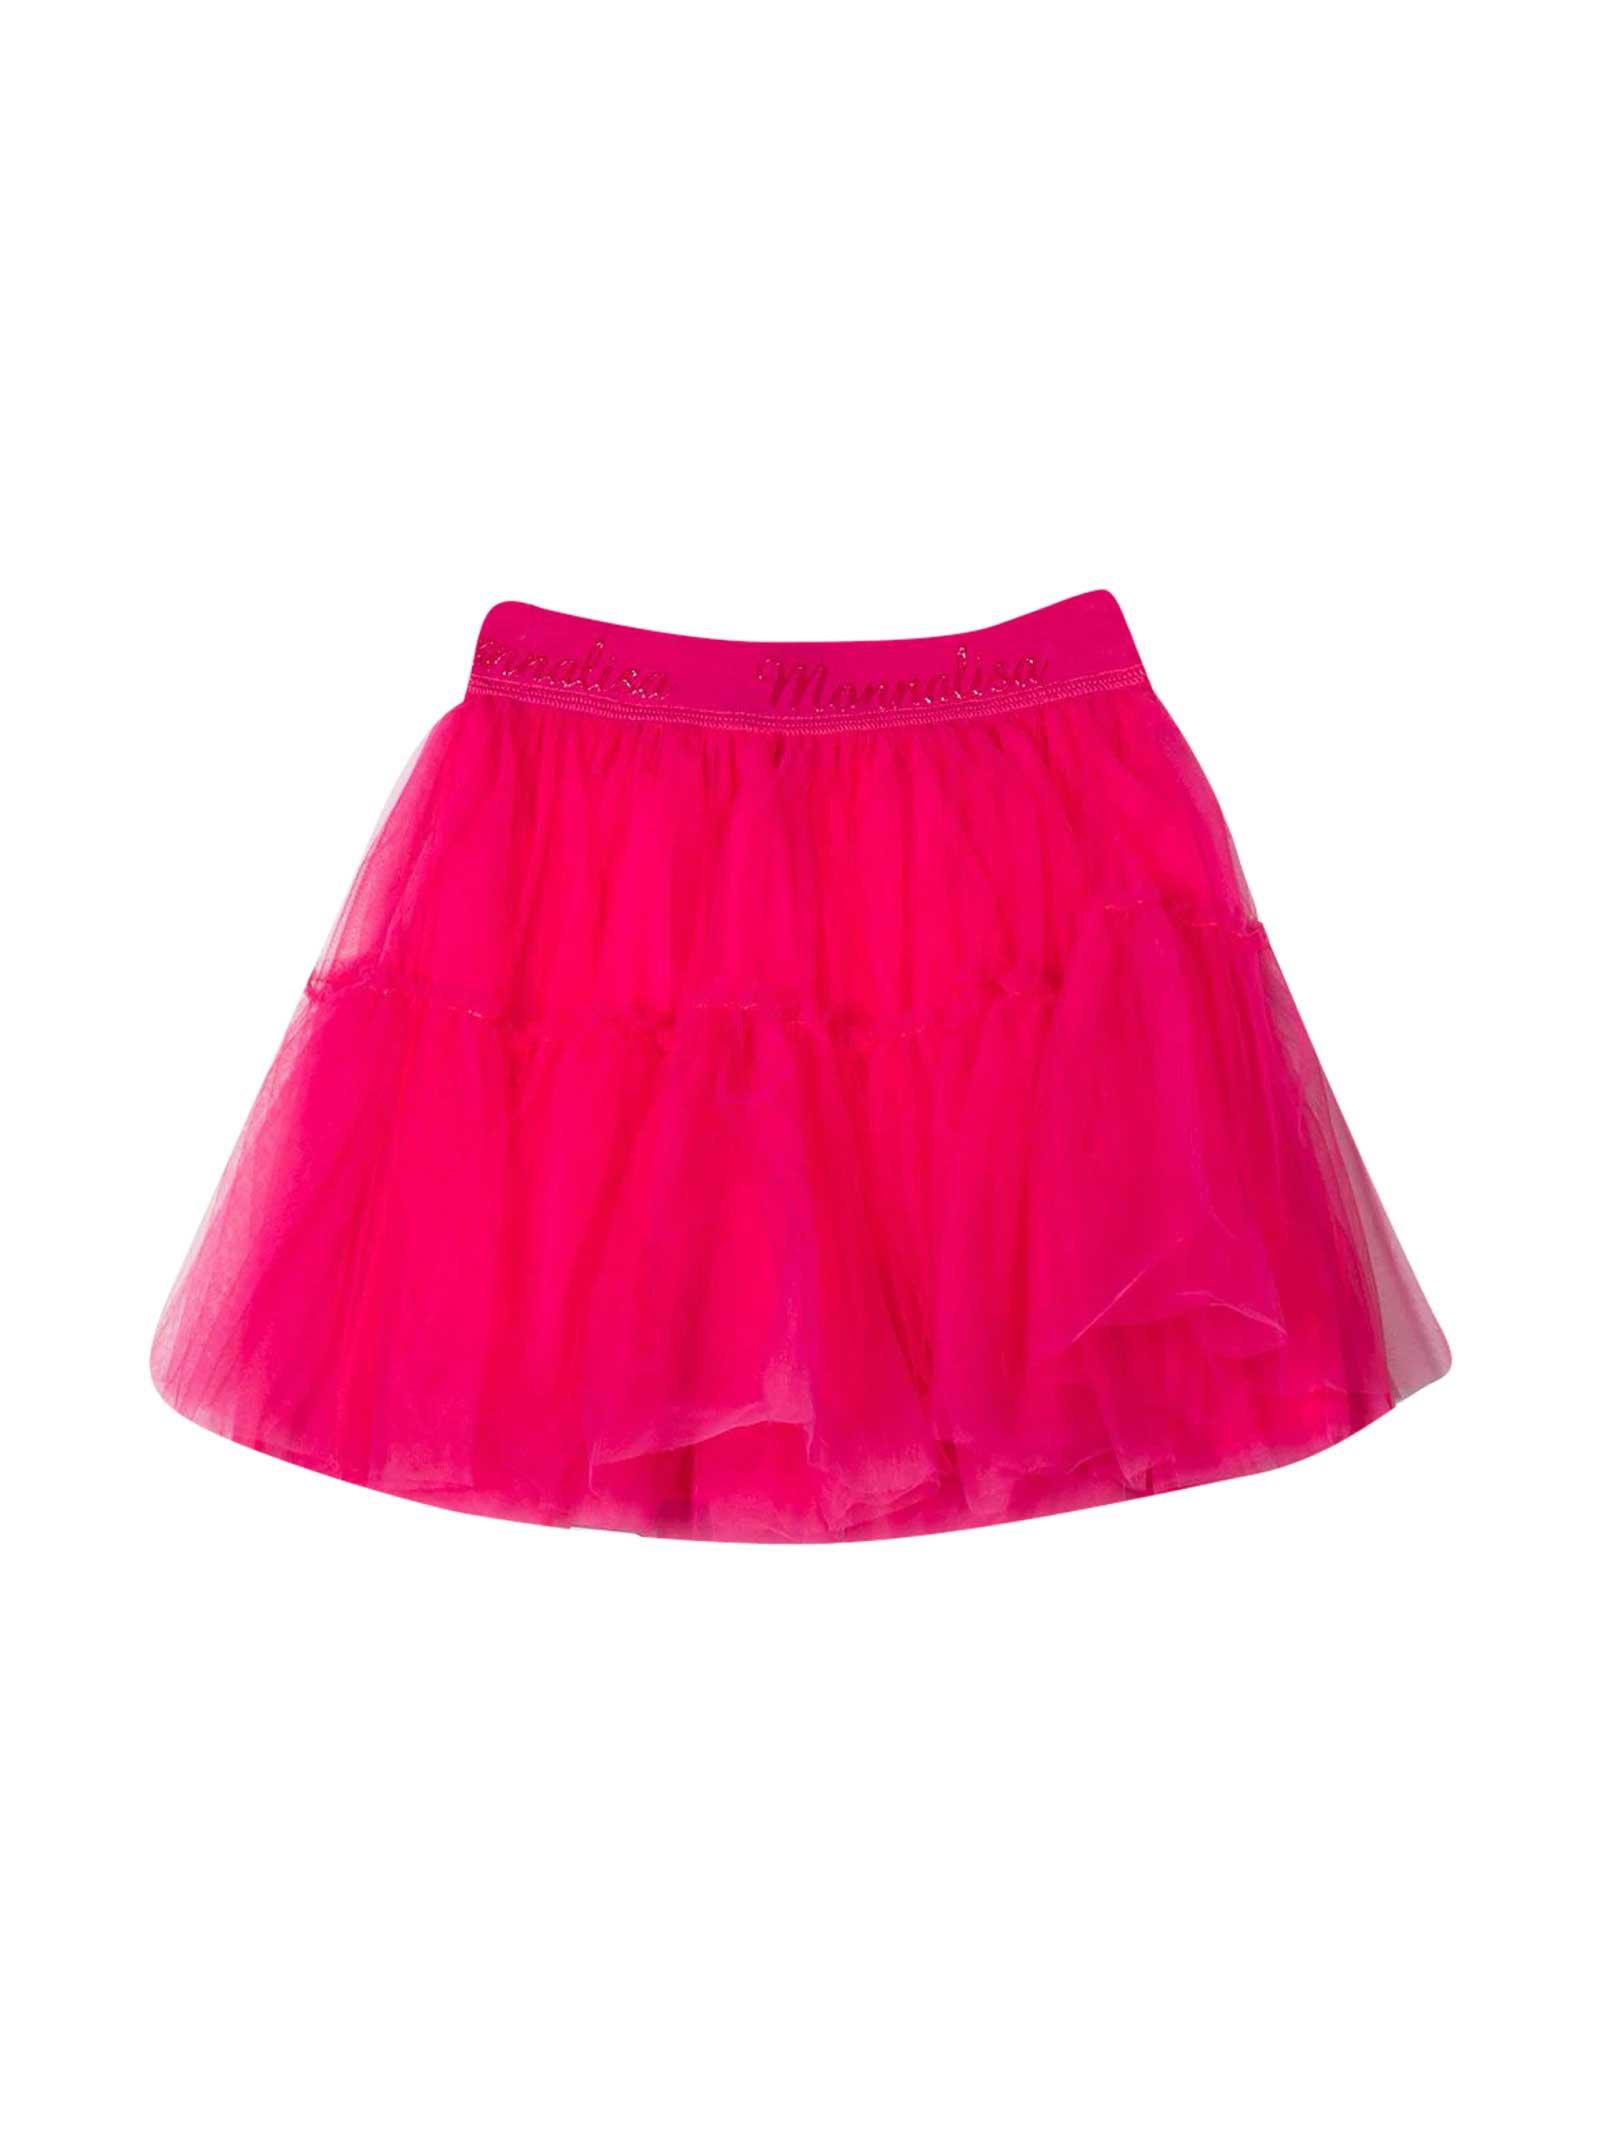 Monnalisa Monnalisa Fuchsia Skirt